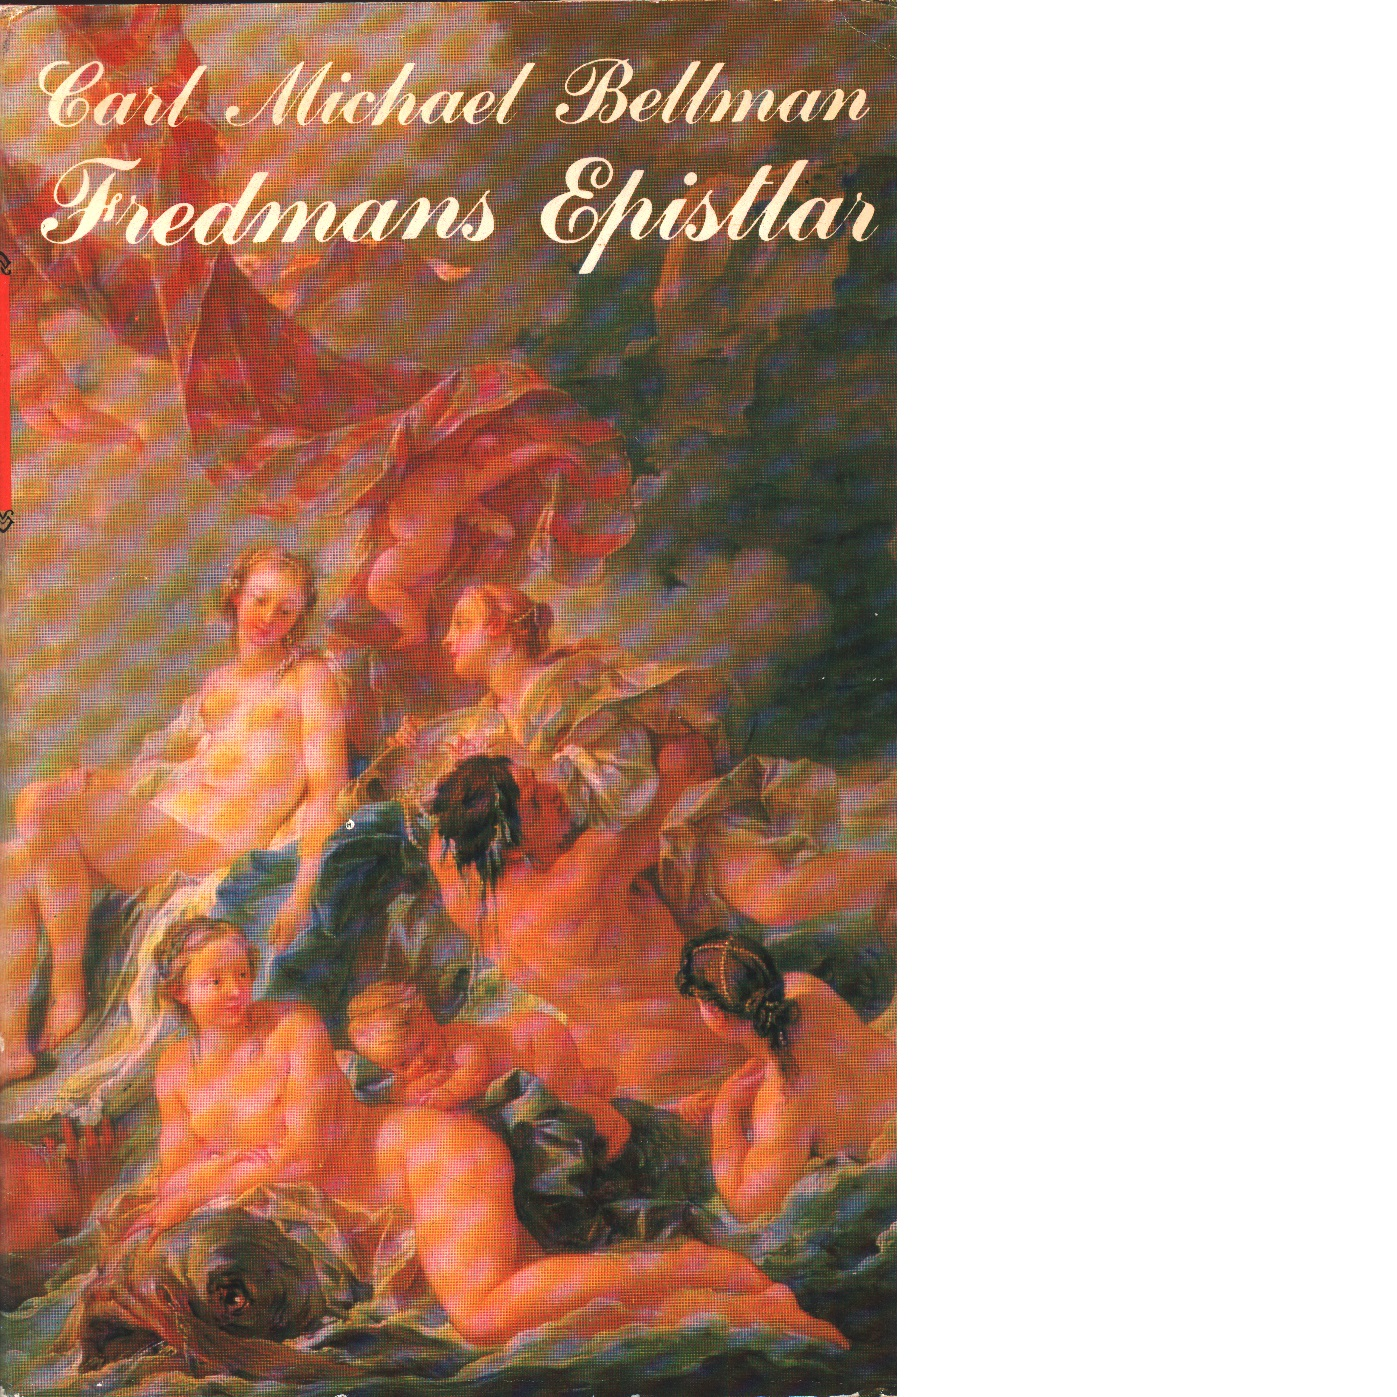 Fredmans epistlar I - Bellman, Carl Michael